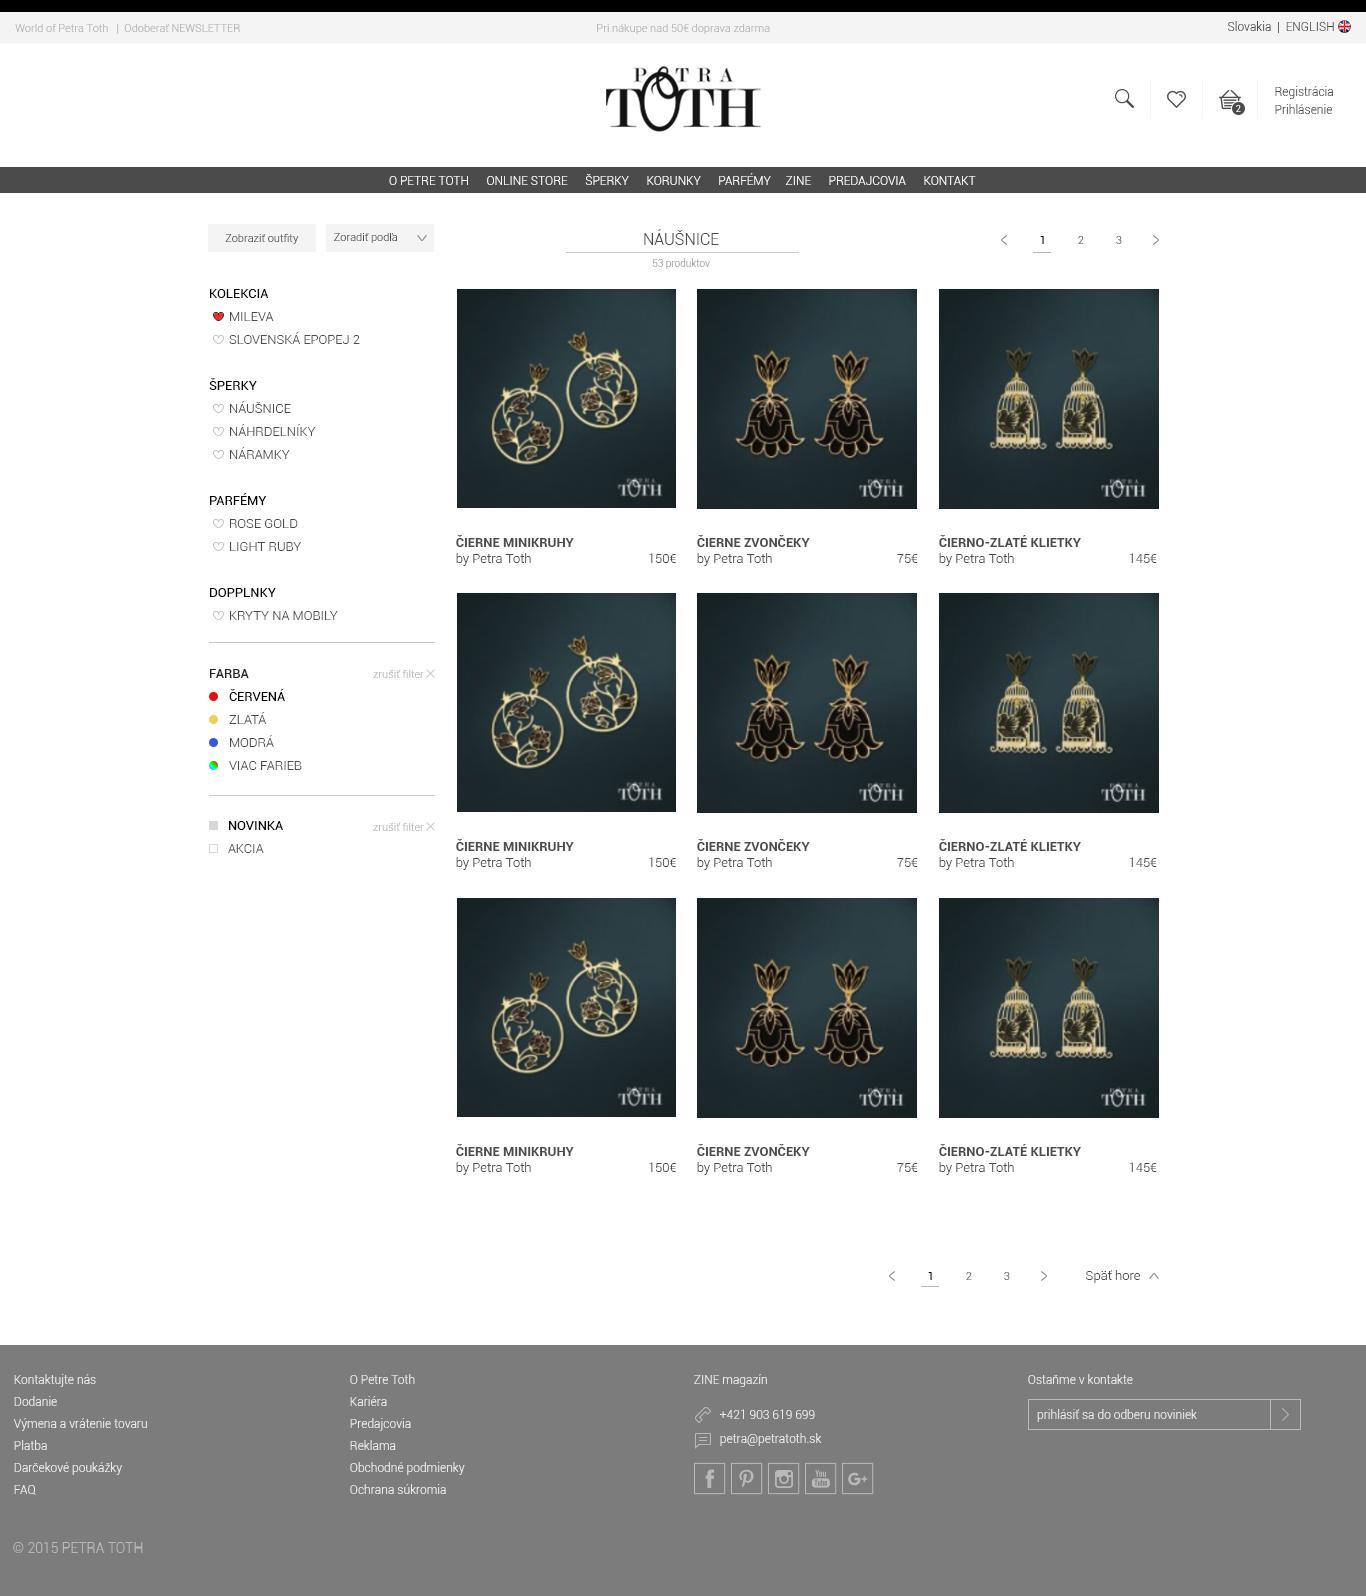 petratoth_web_eshop_kategoria_produktov_07